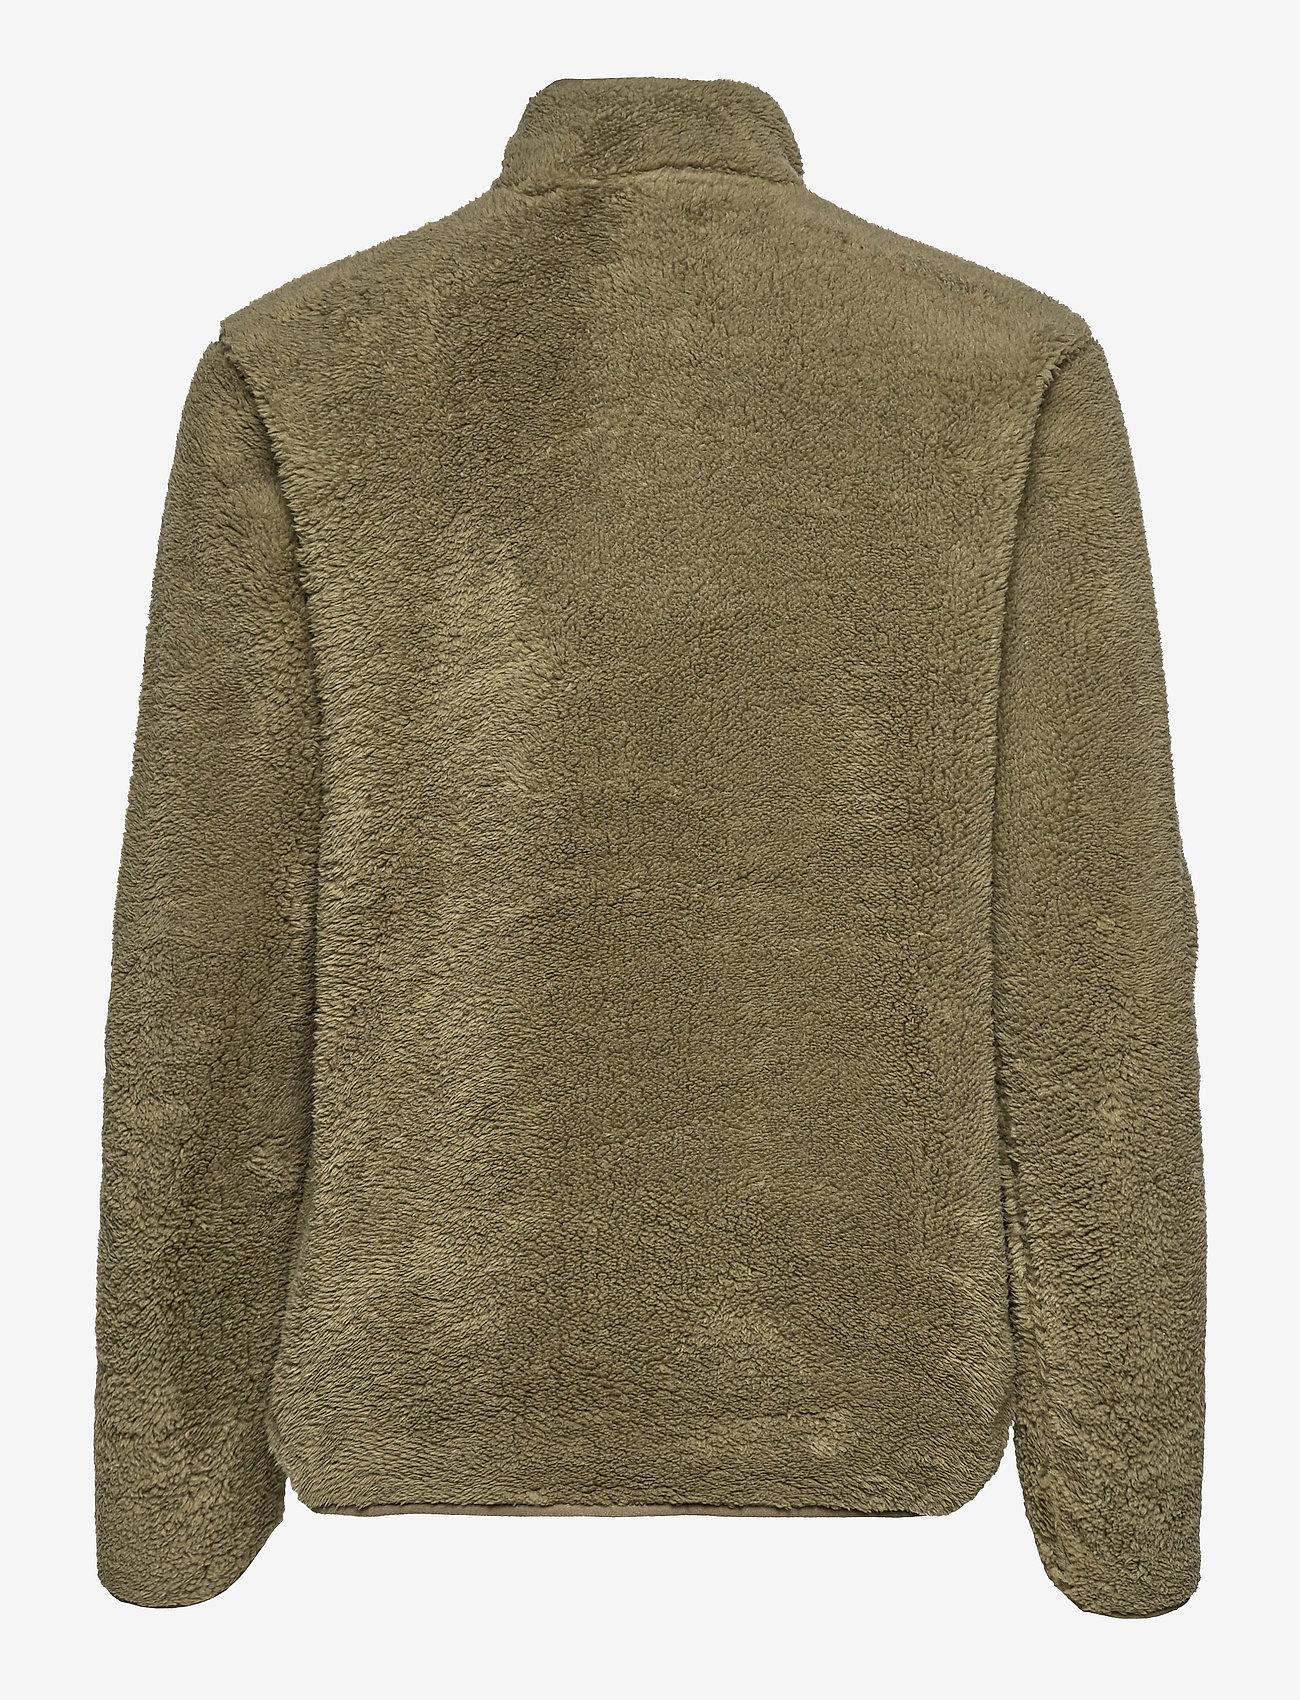 Tenson - Nechako Pile Jkt W - outdoor & rain jackets - olive - 1